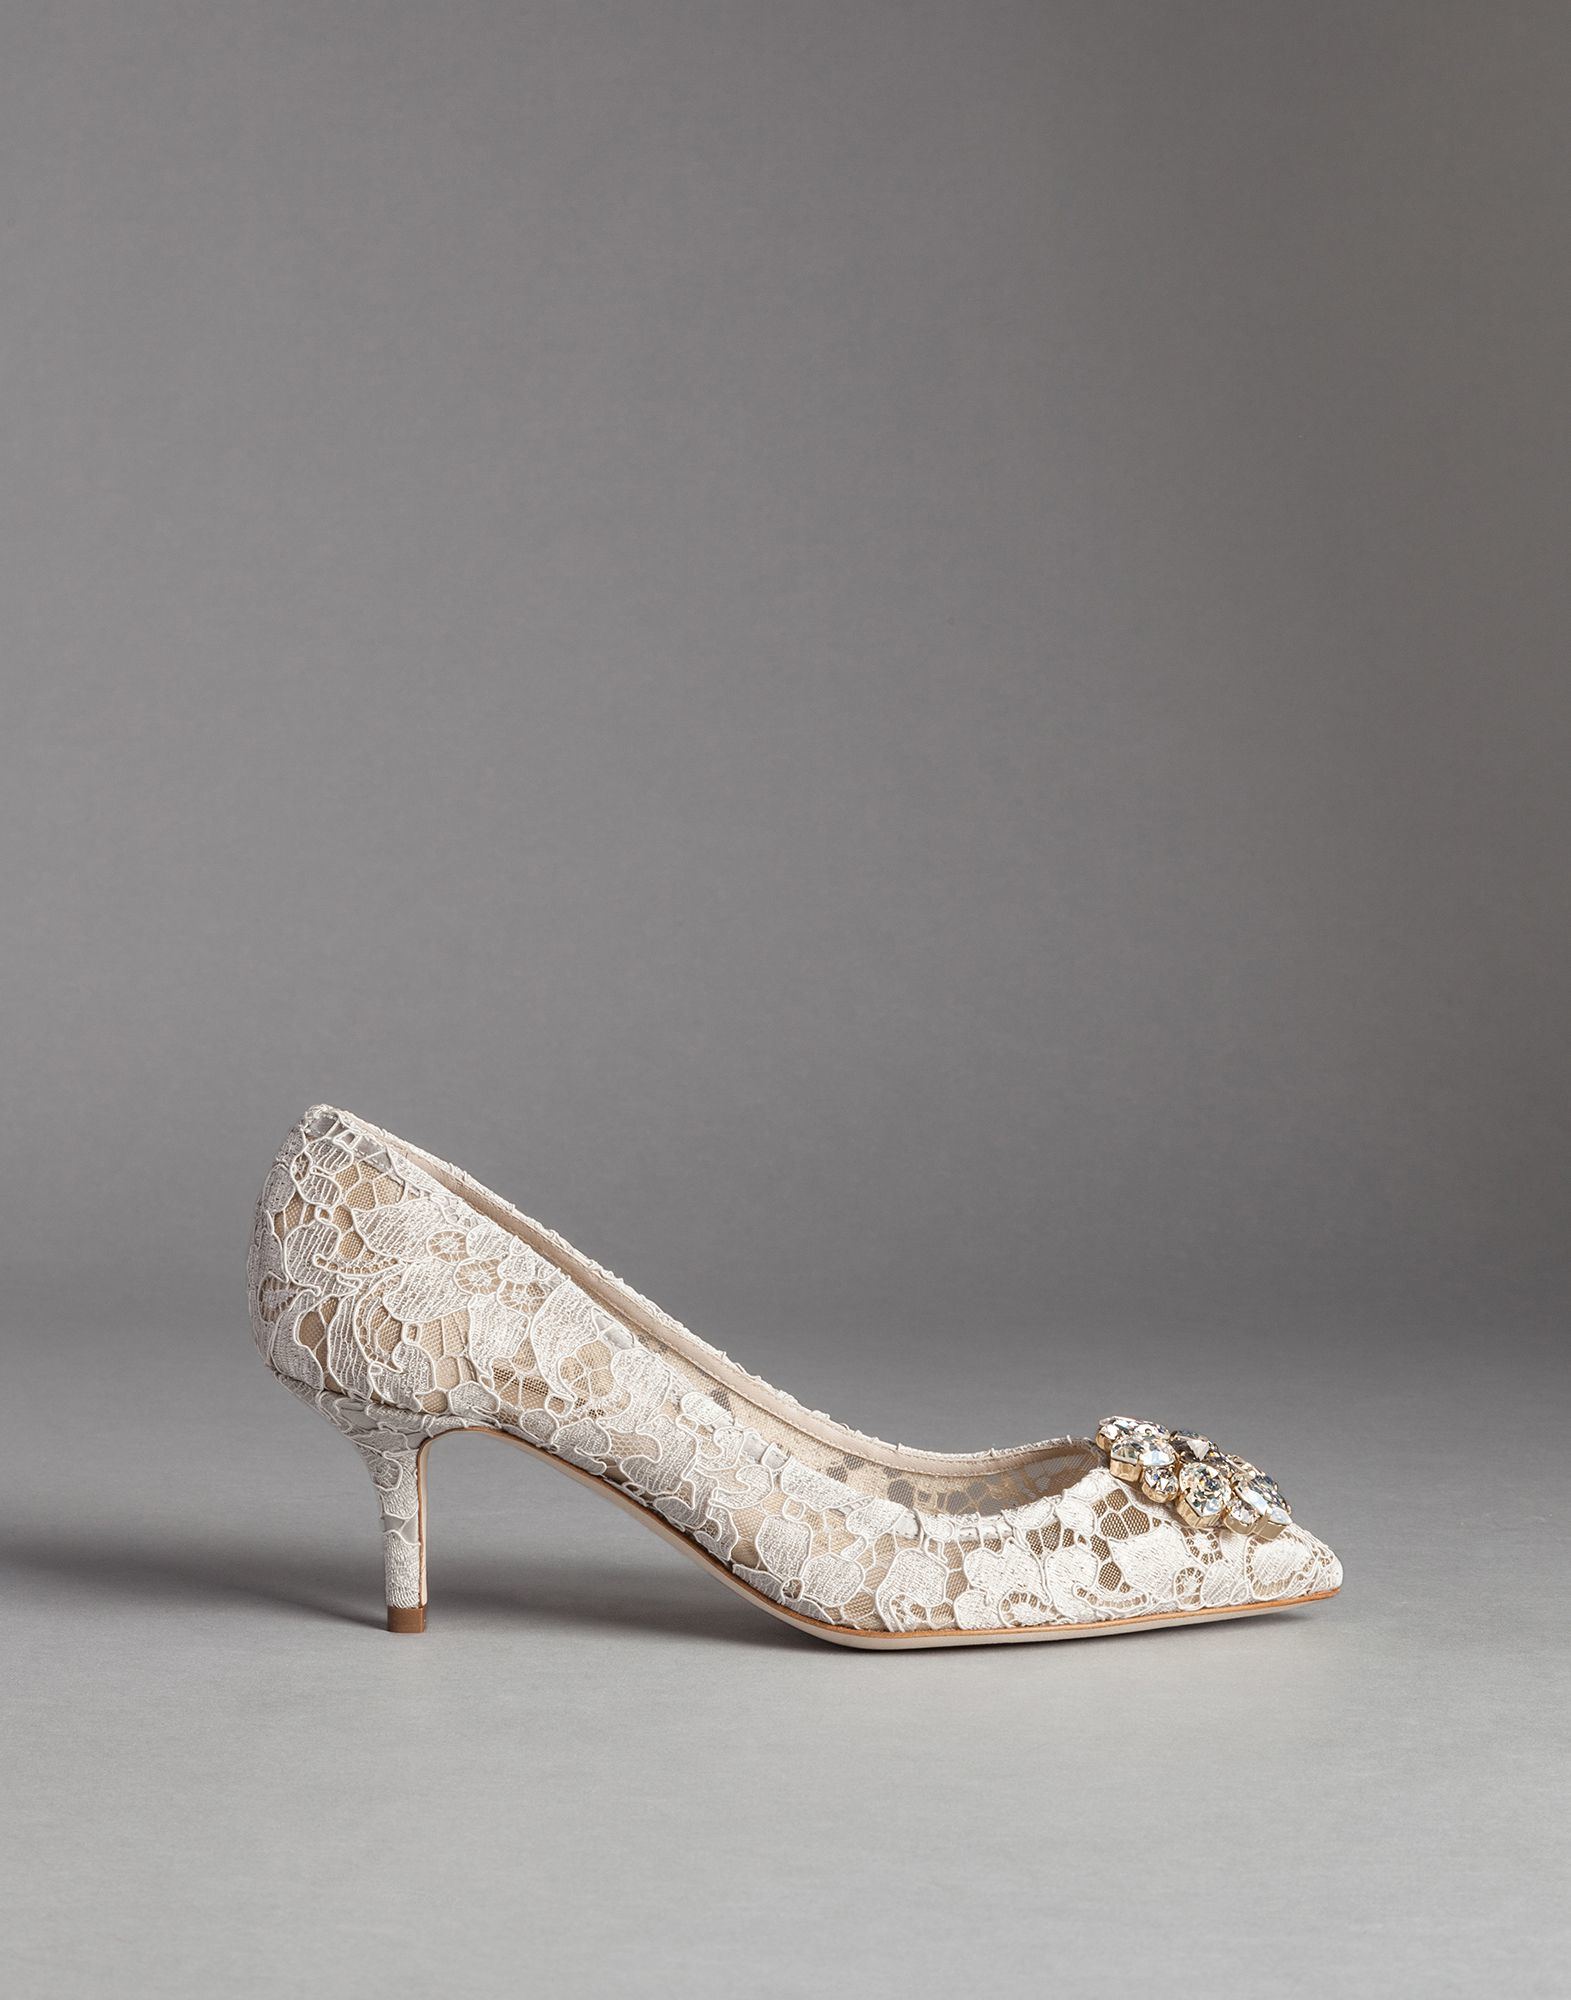 Bellucci pumps - Grey Dolce & Gabbana 9sMFrh